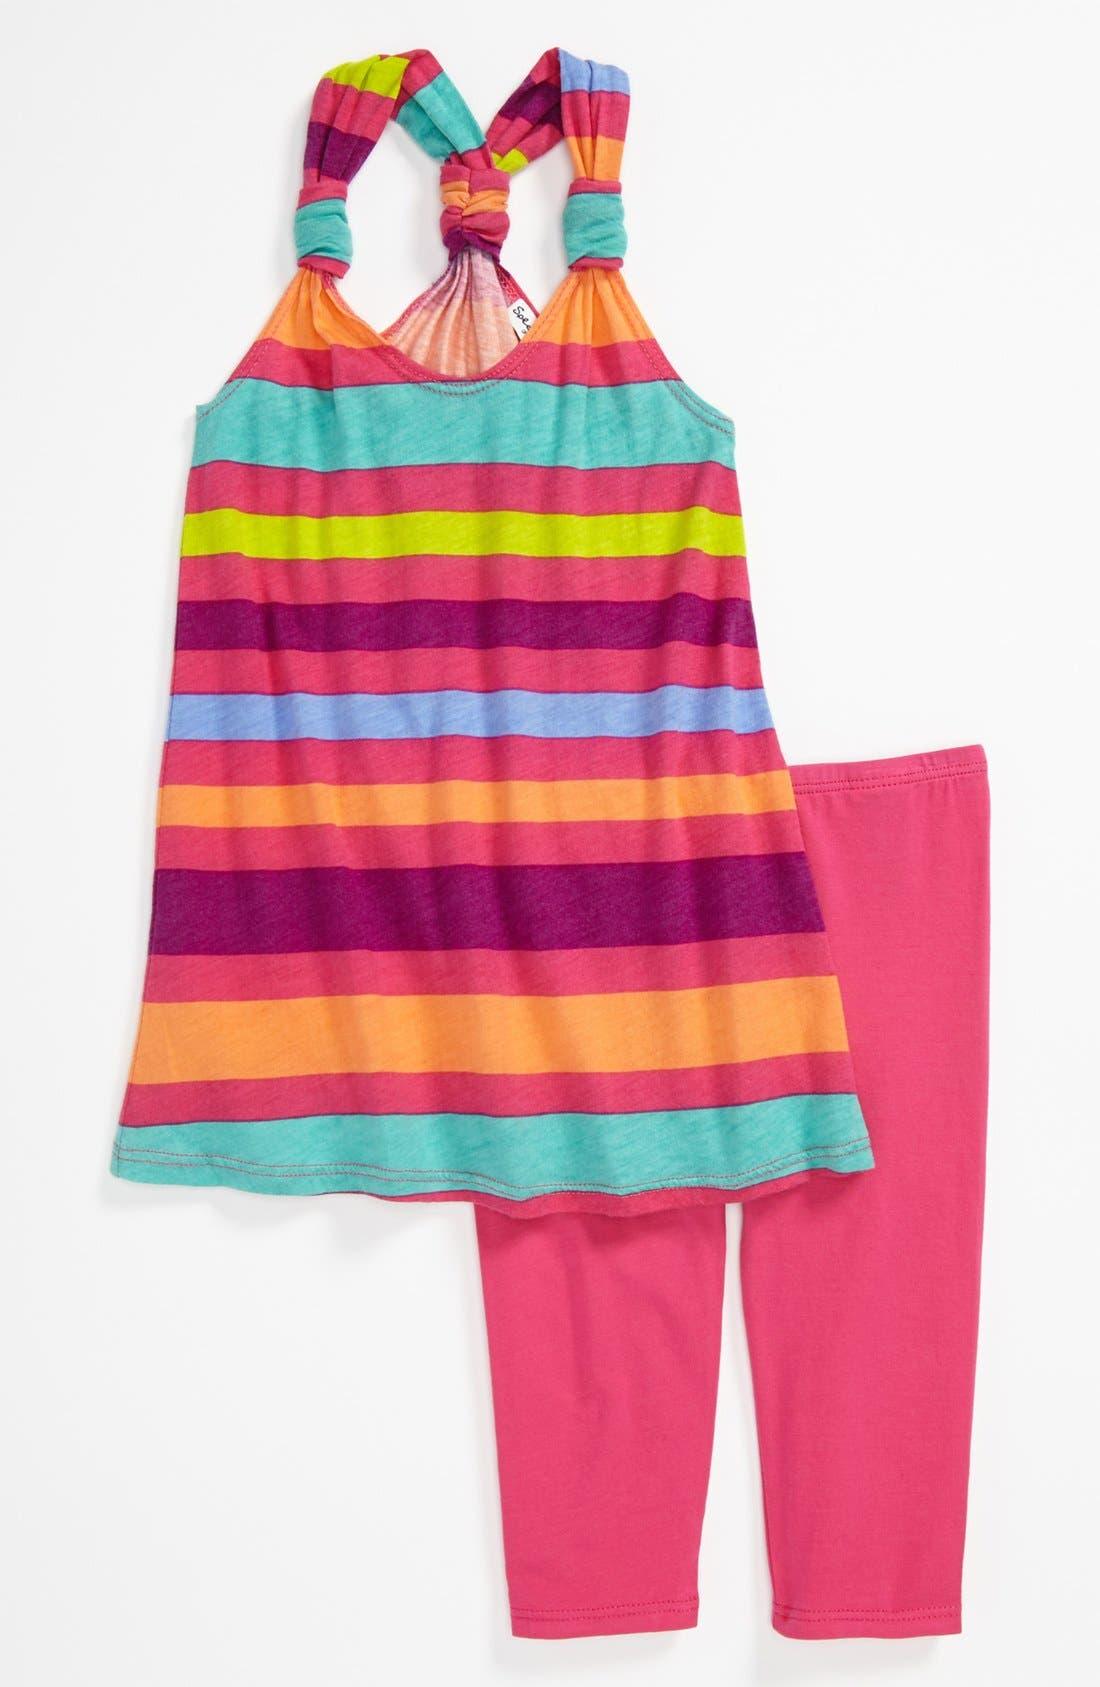 Alternate Image 1 Selected - Splendid 'Carnival Stripe' Tank Top & Leggings (Toddler)